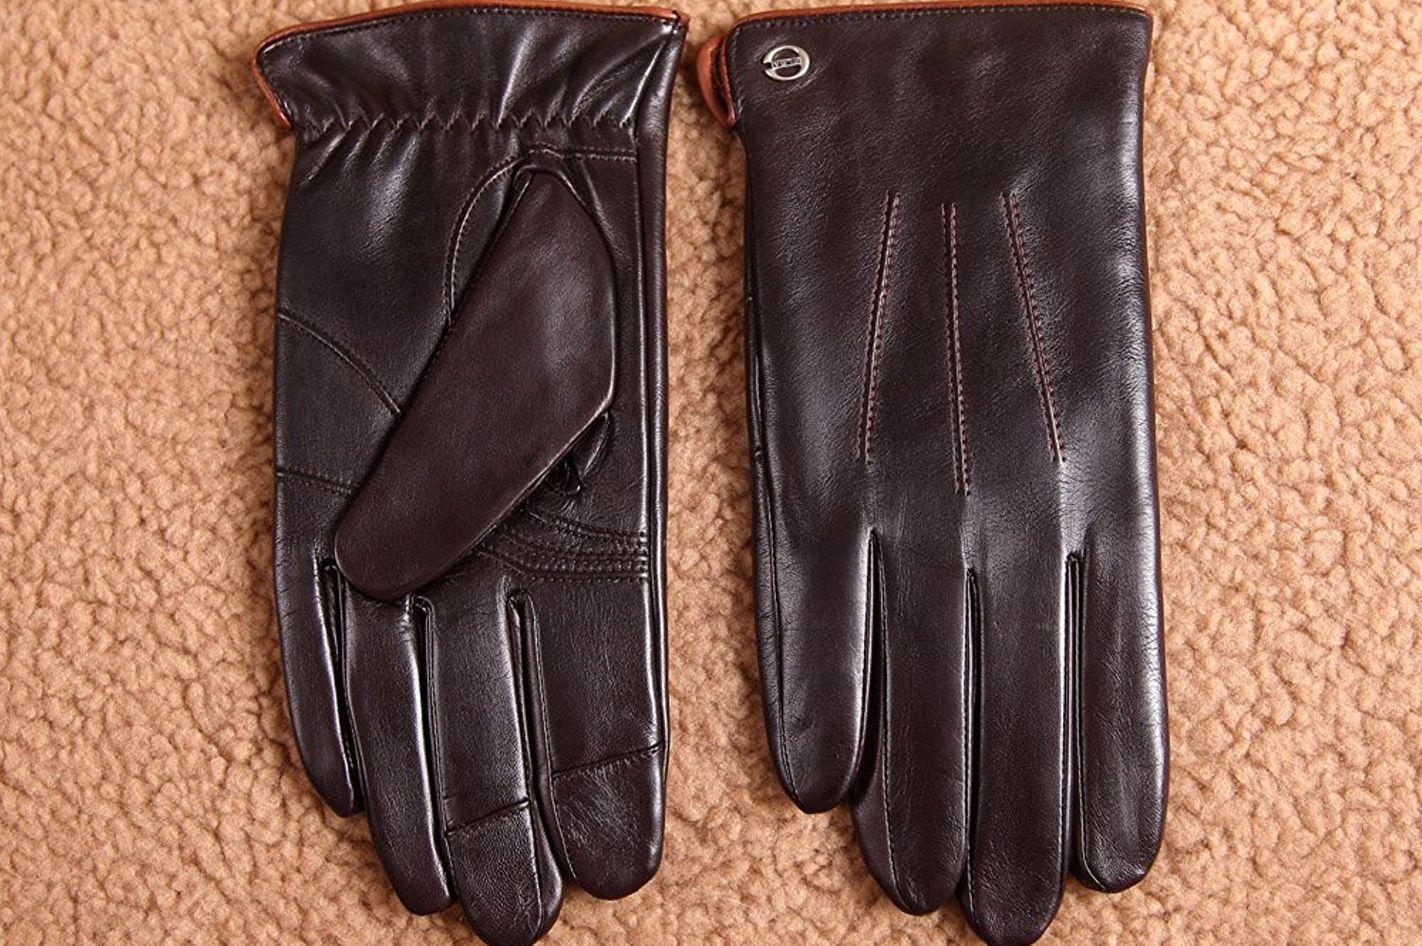 Elma Luxury Men's Touchscreen Leather Gloves